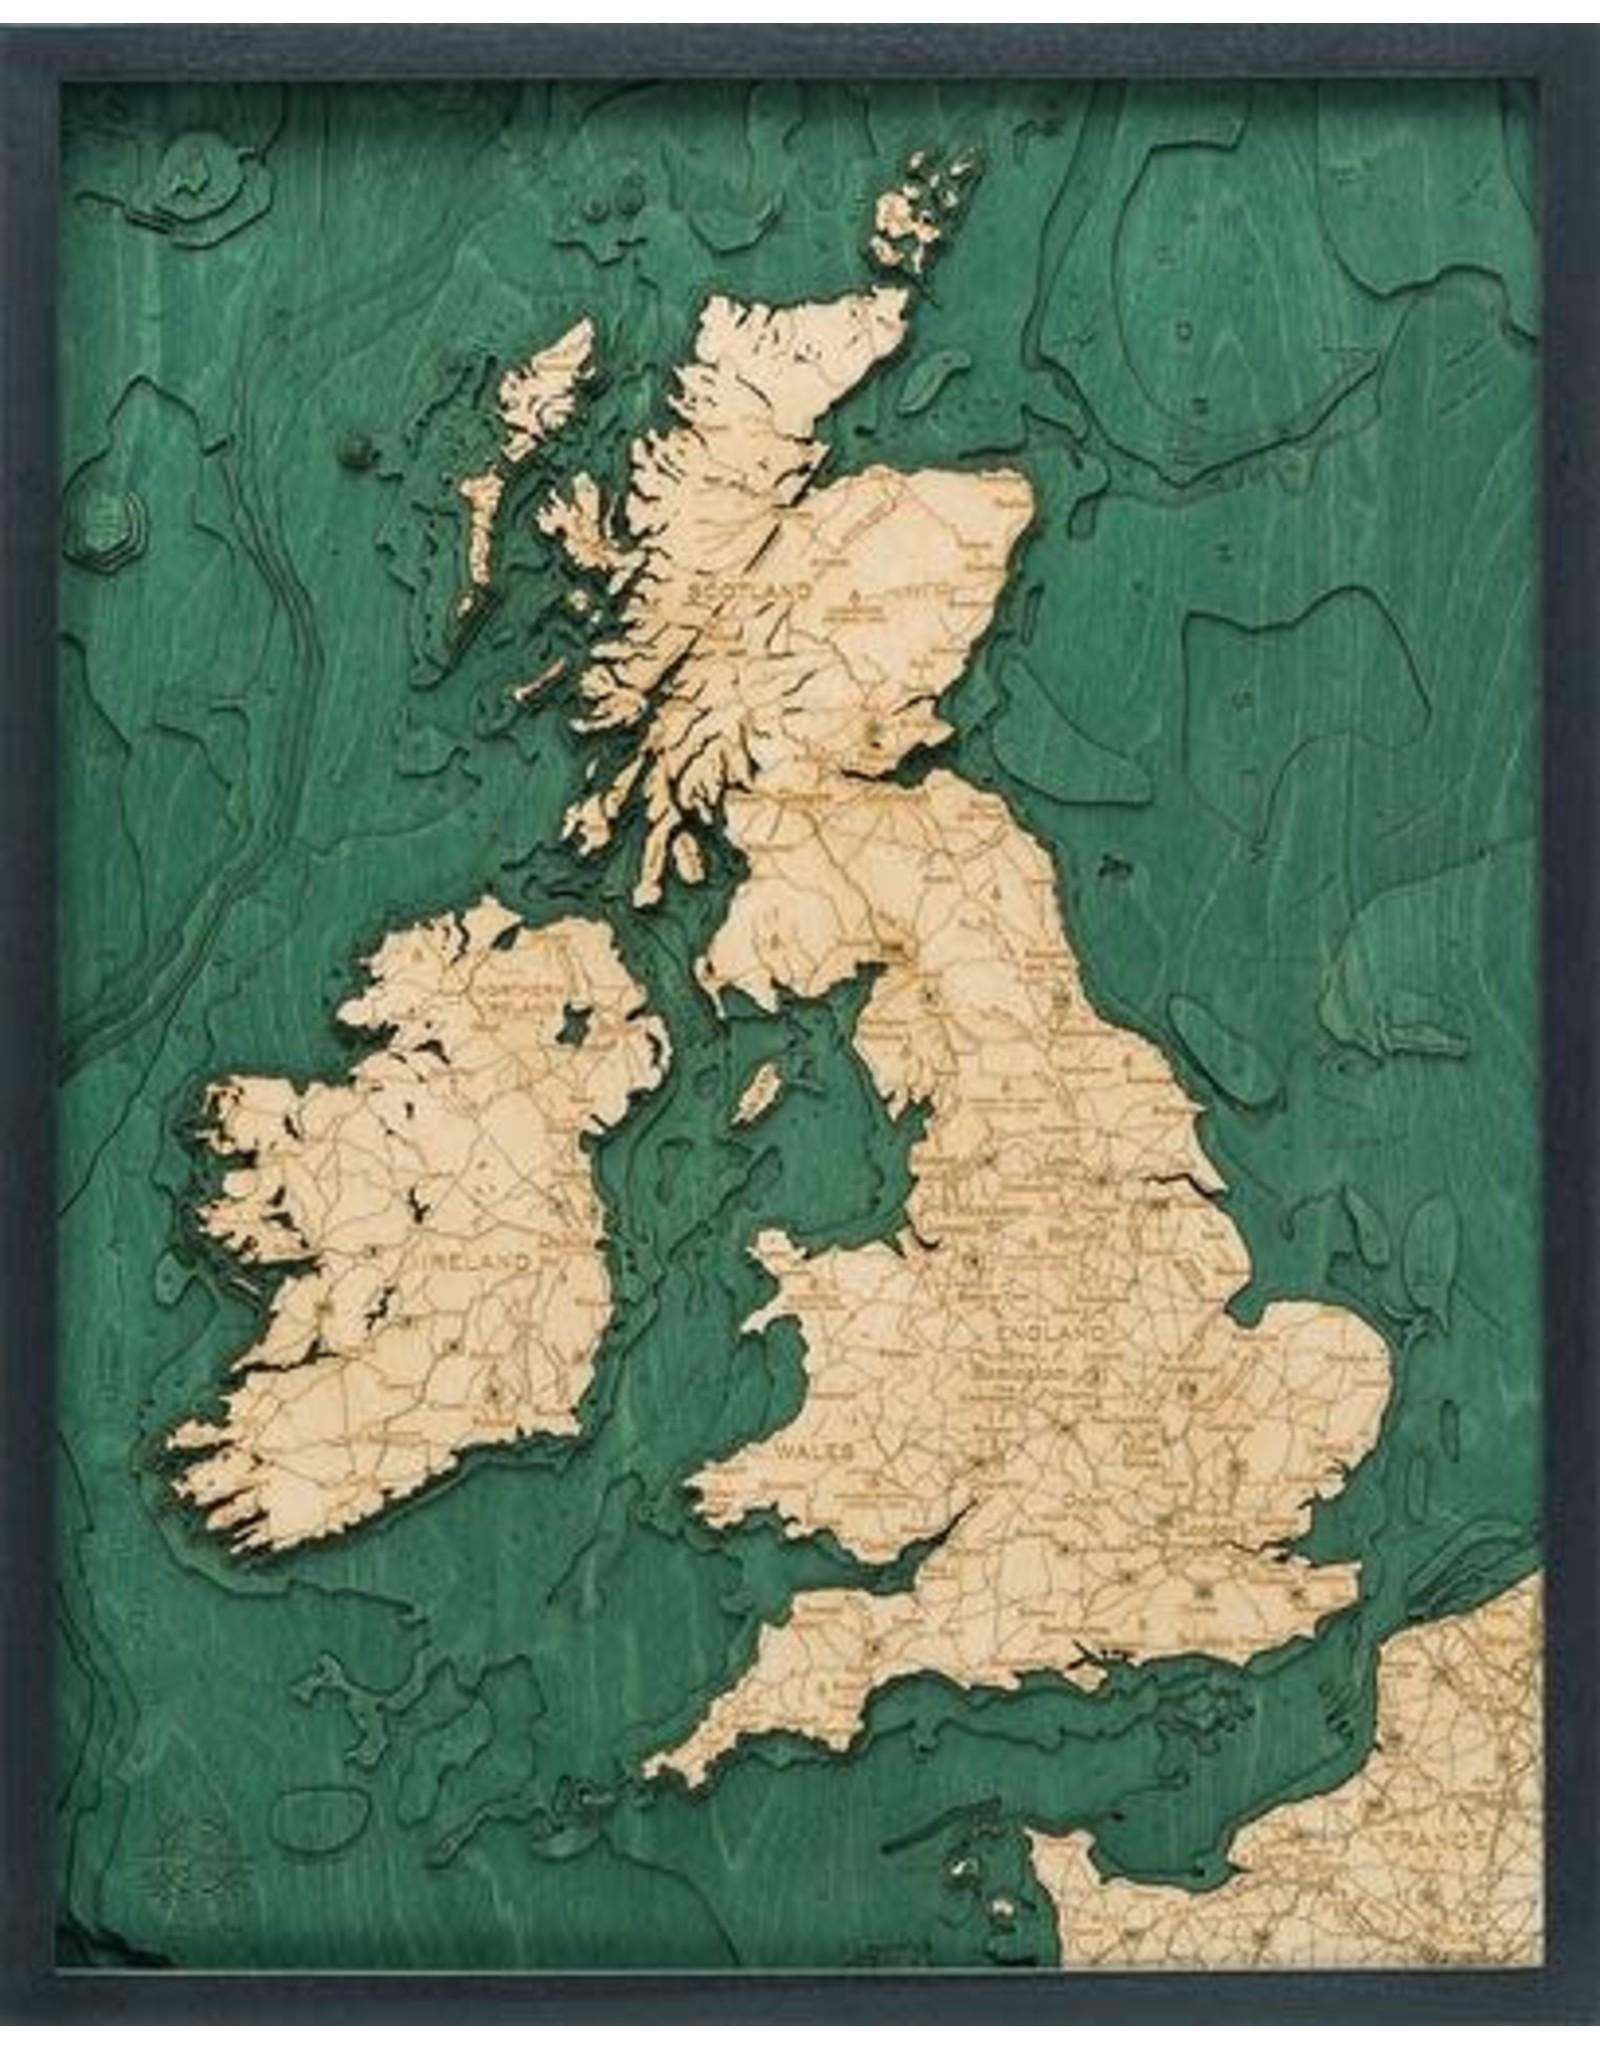 WoodCharts United Kingdom (Bathymetric 3-D Nautical WOODCHART)